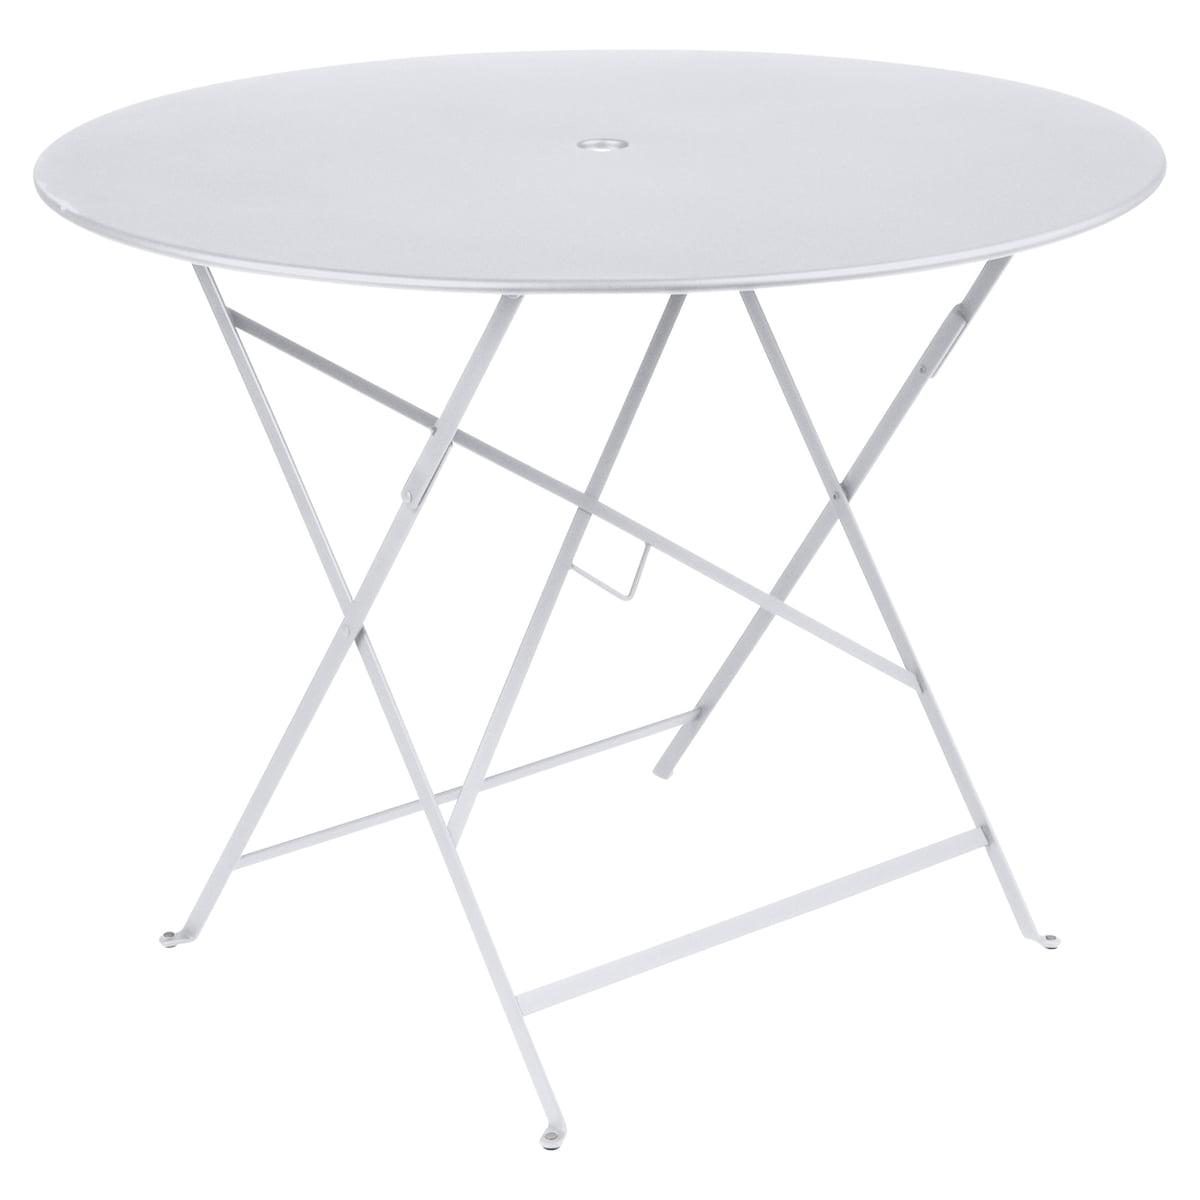 Det runde klapbord fra Fermob i interiørshoppen